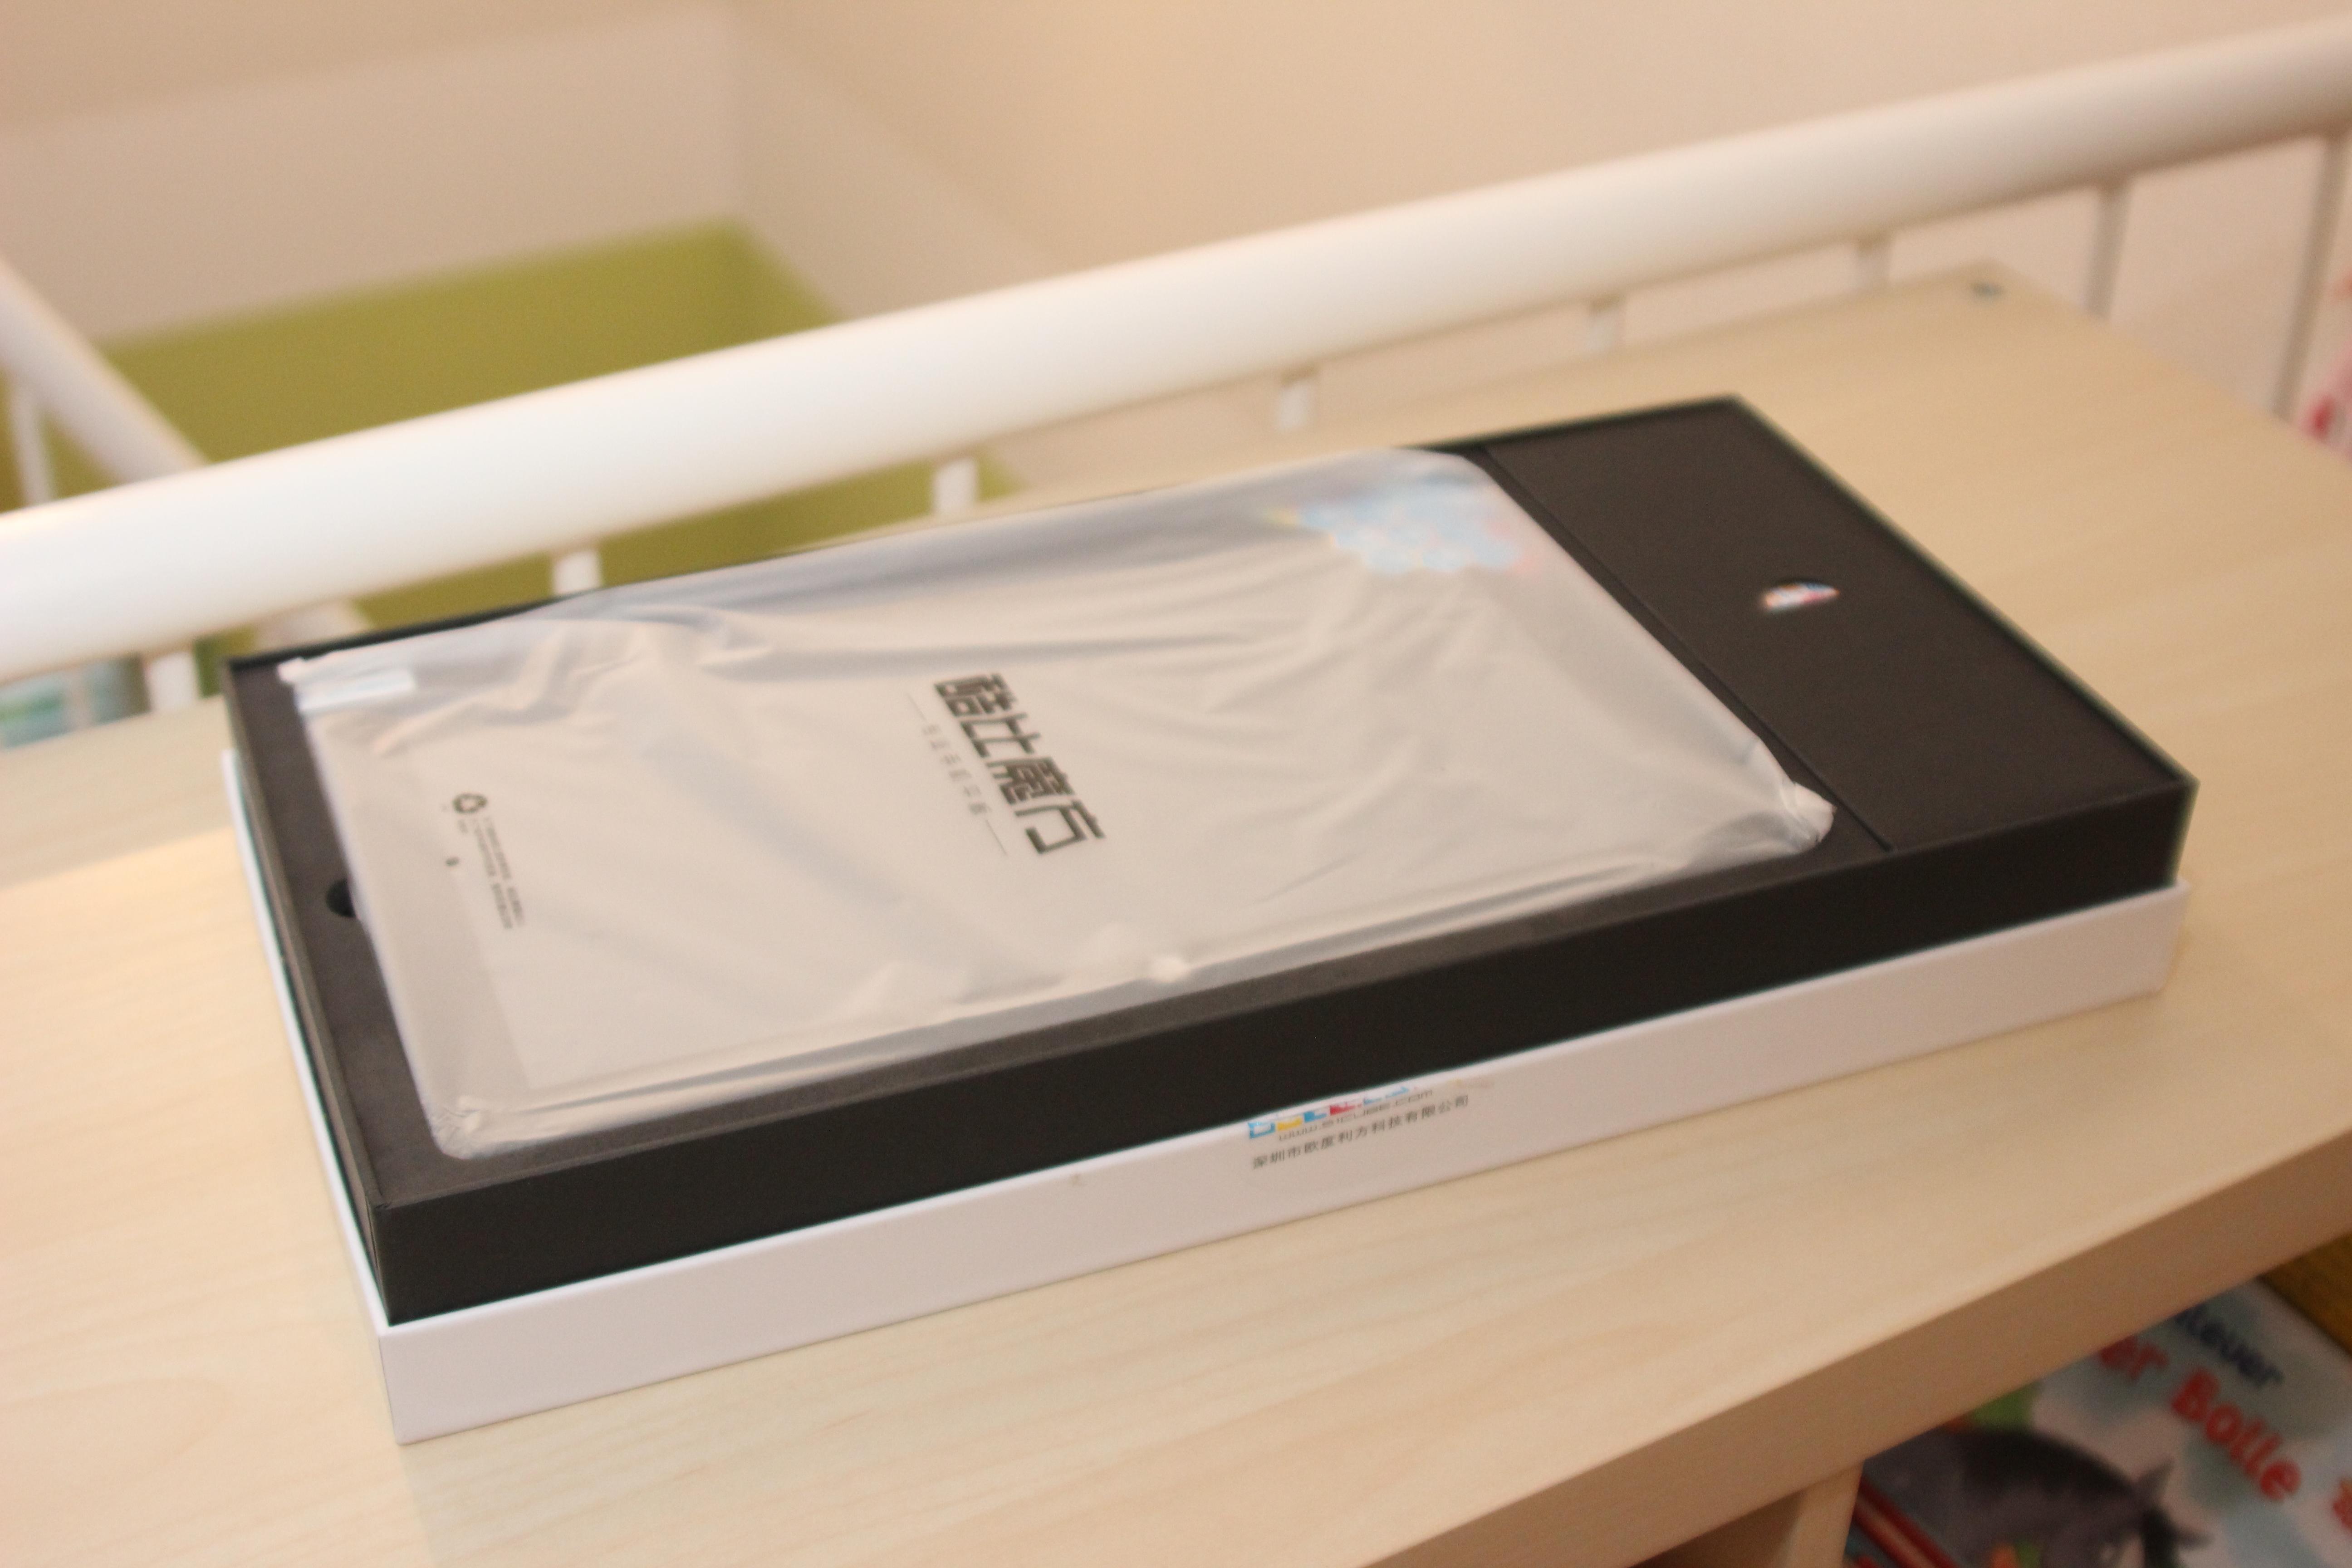 cube i7 remix verpackung innen. Black Bedroom Furniture Sets. Home Design Ideas